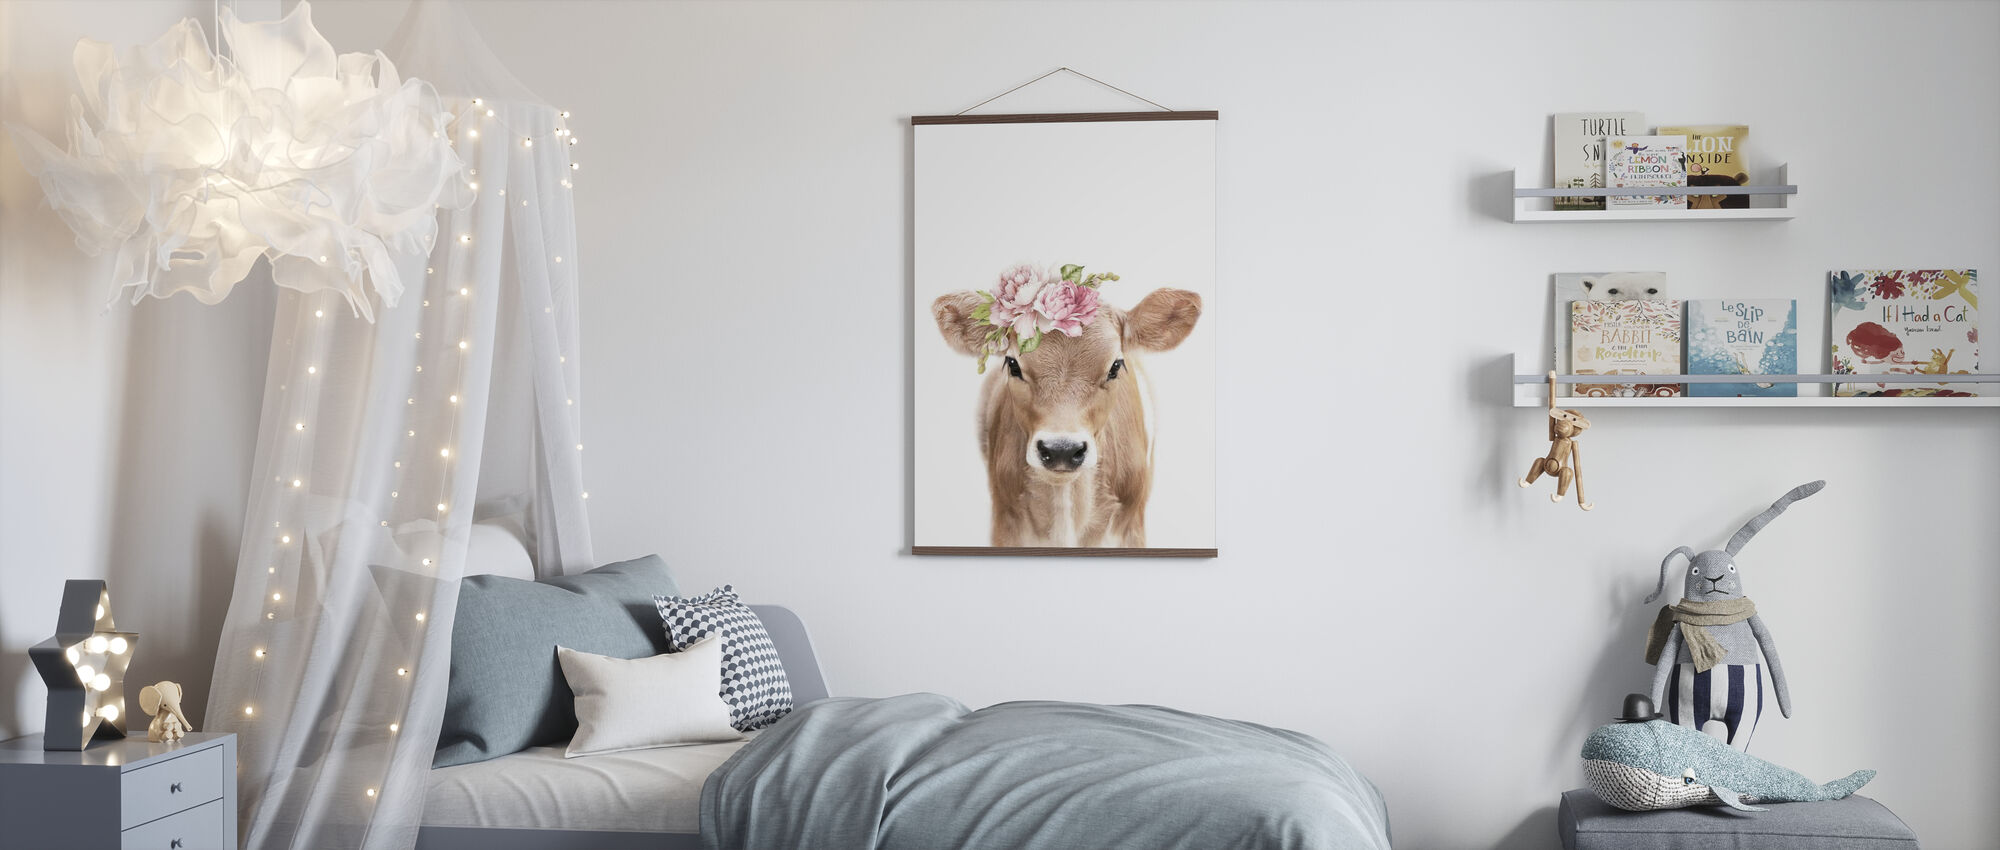 Floral Calf - Poster - Kids Room